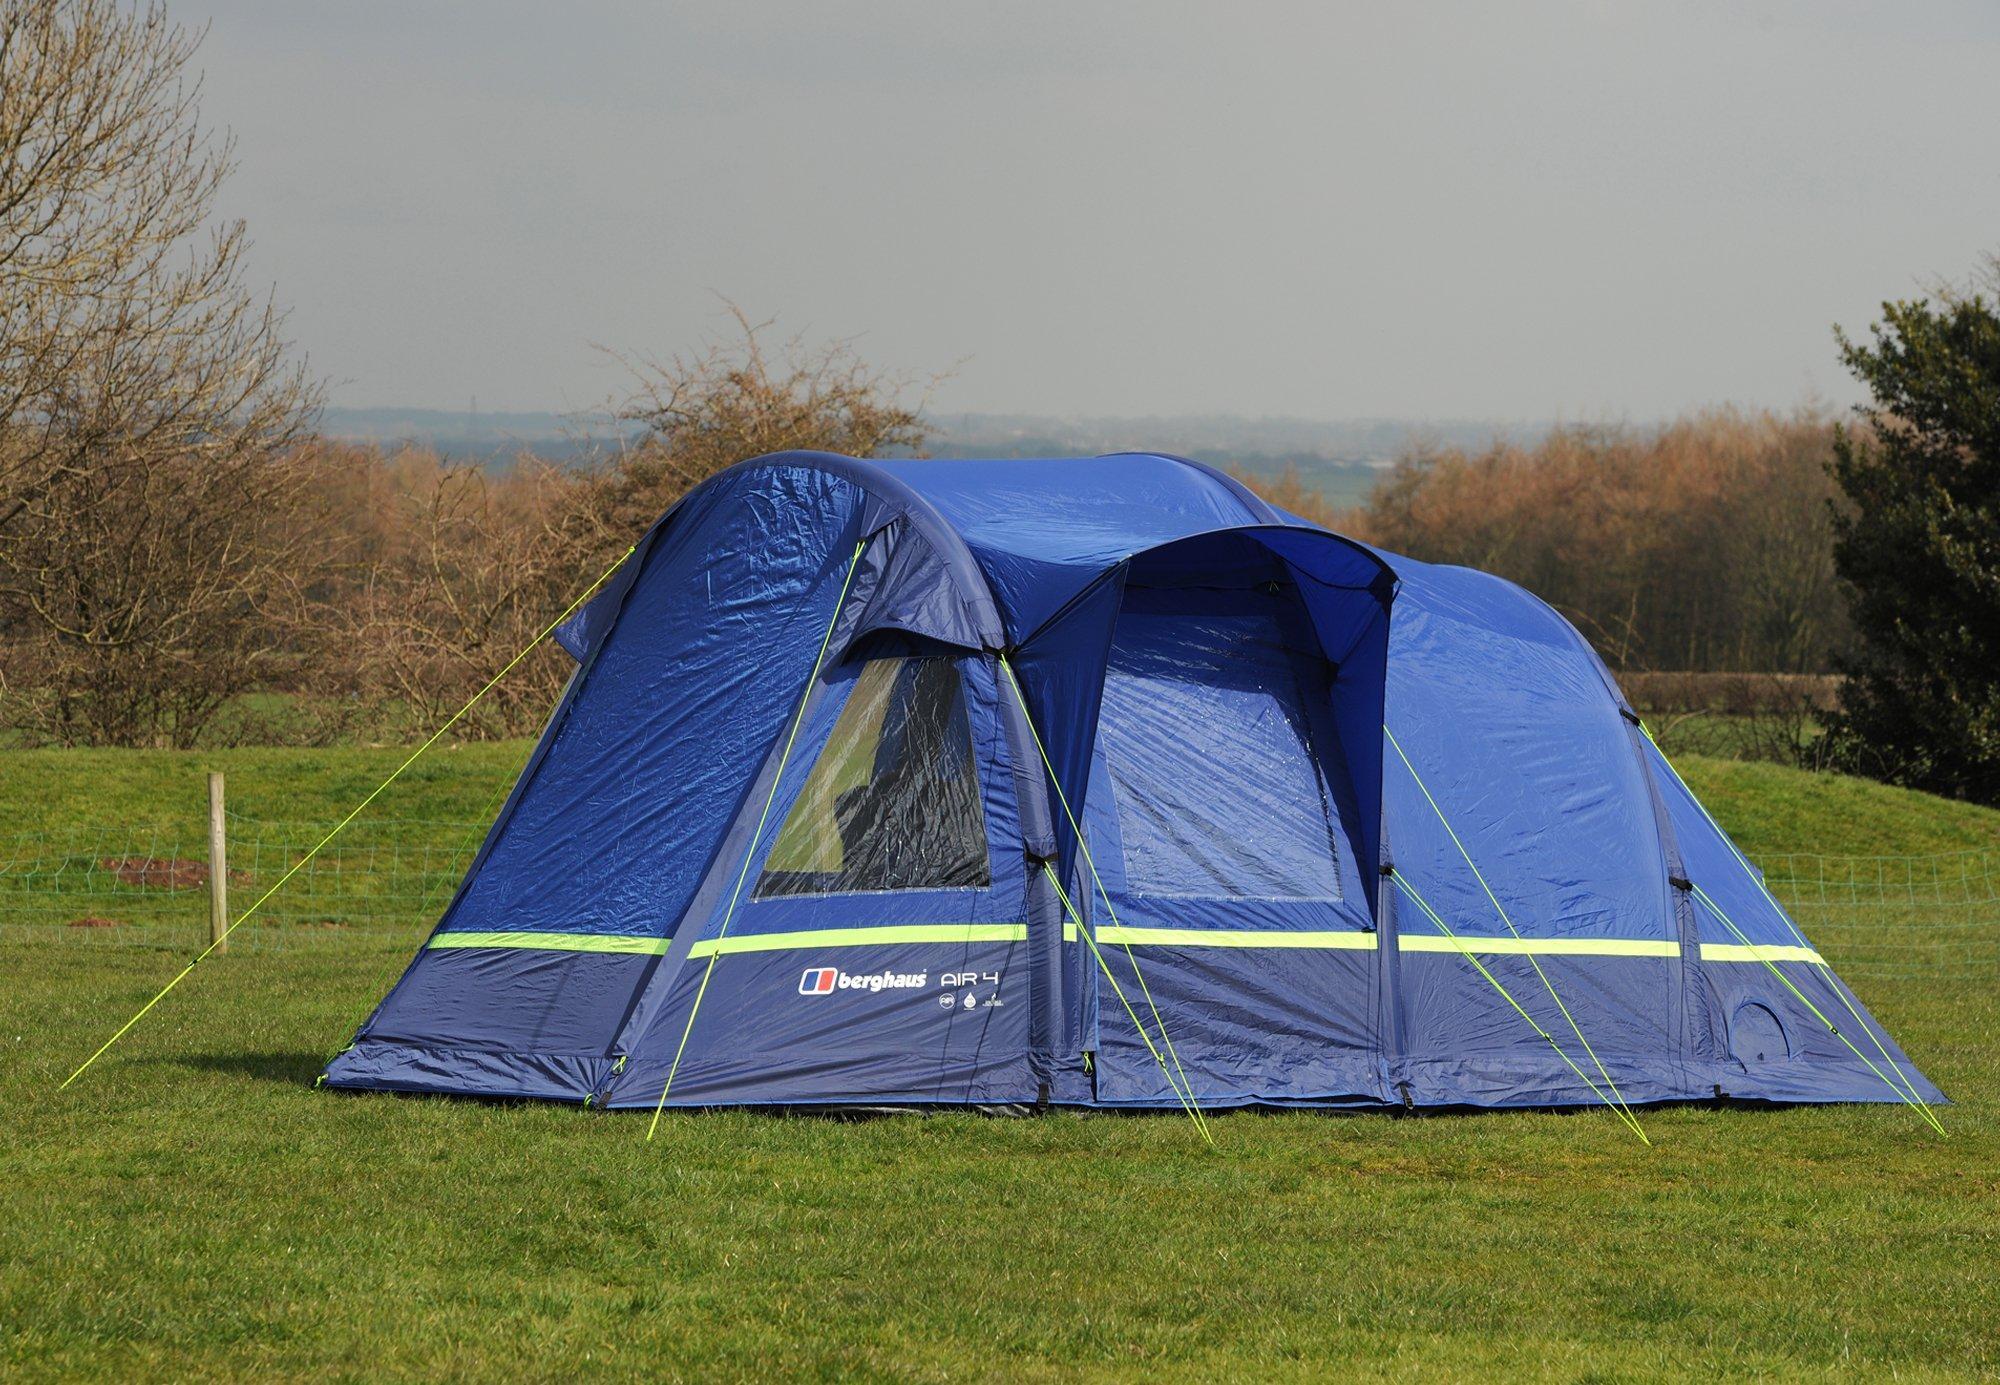 Berghaus Air 4 Family Tent